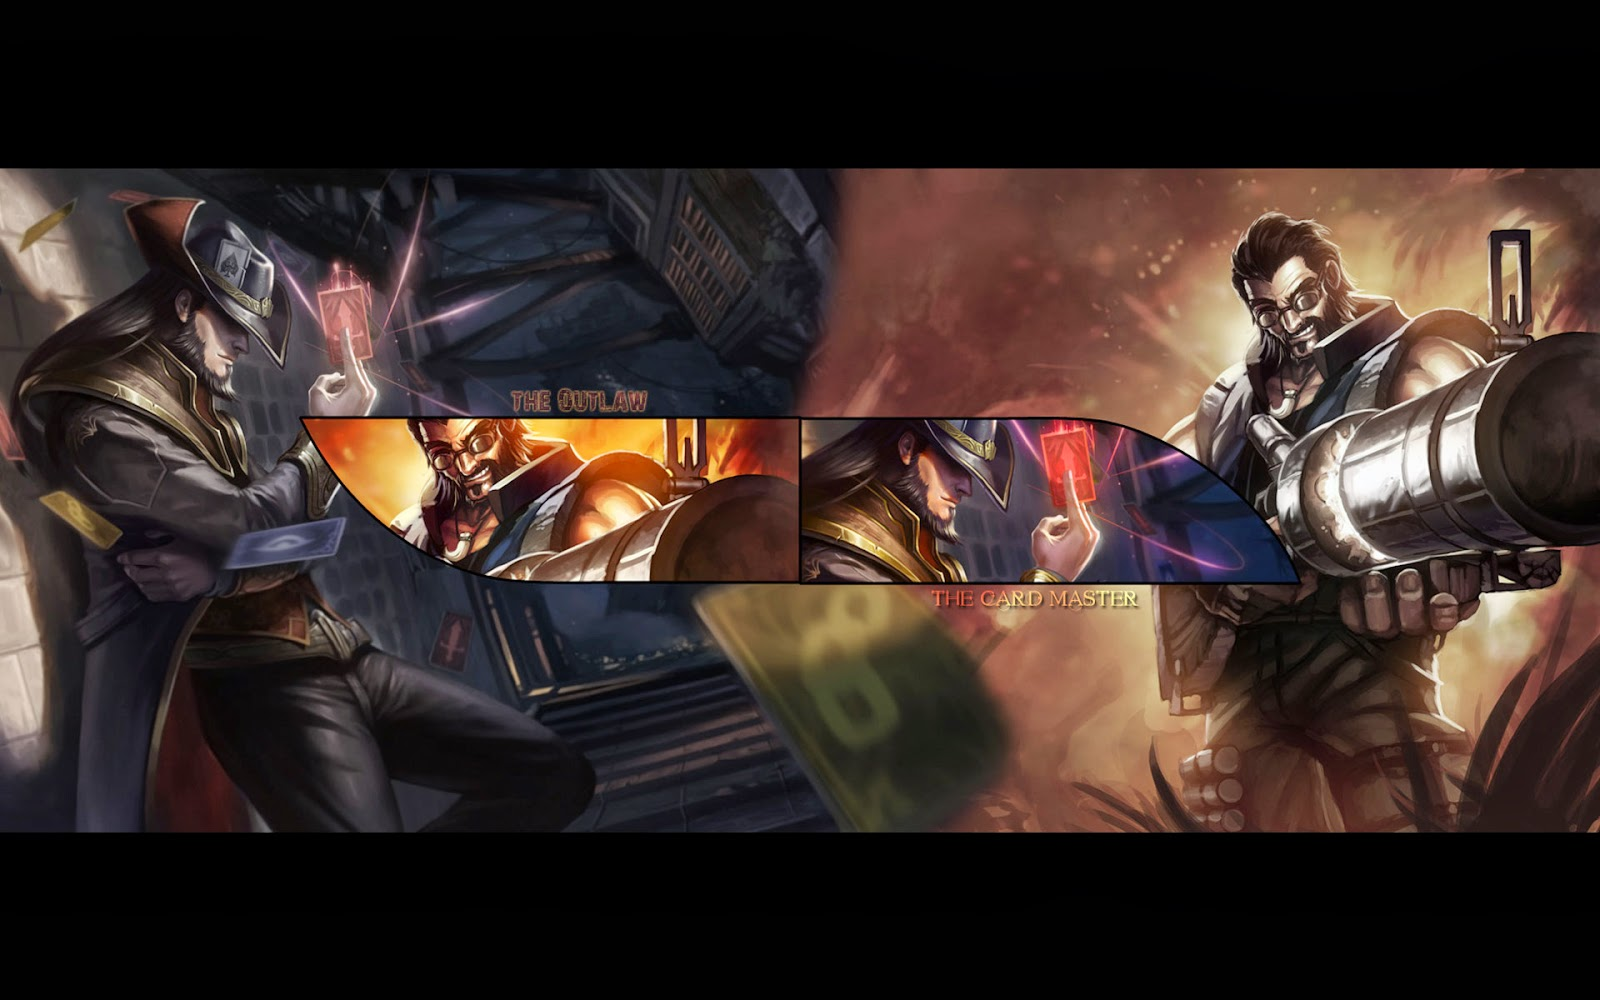 Twisted Fate League of Legends Wallpaper Twisted Fate Desktop 1600x1000